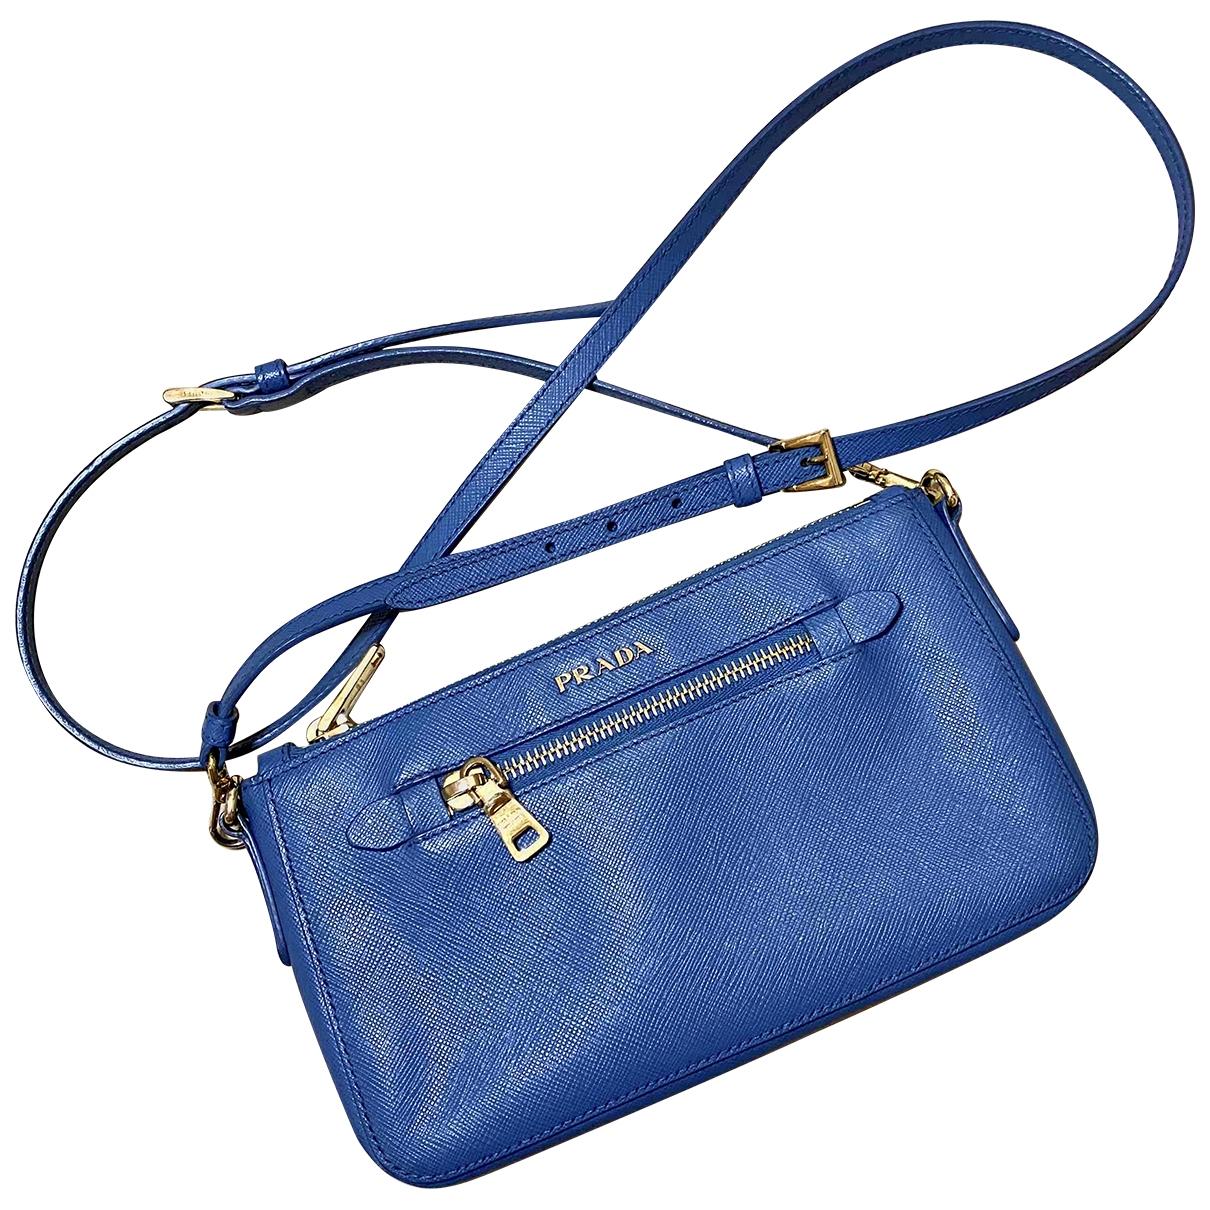 Prada \N Blue Leather handbag for Women \N